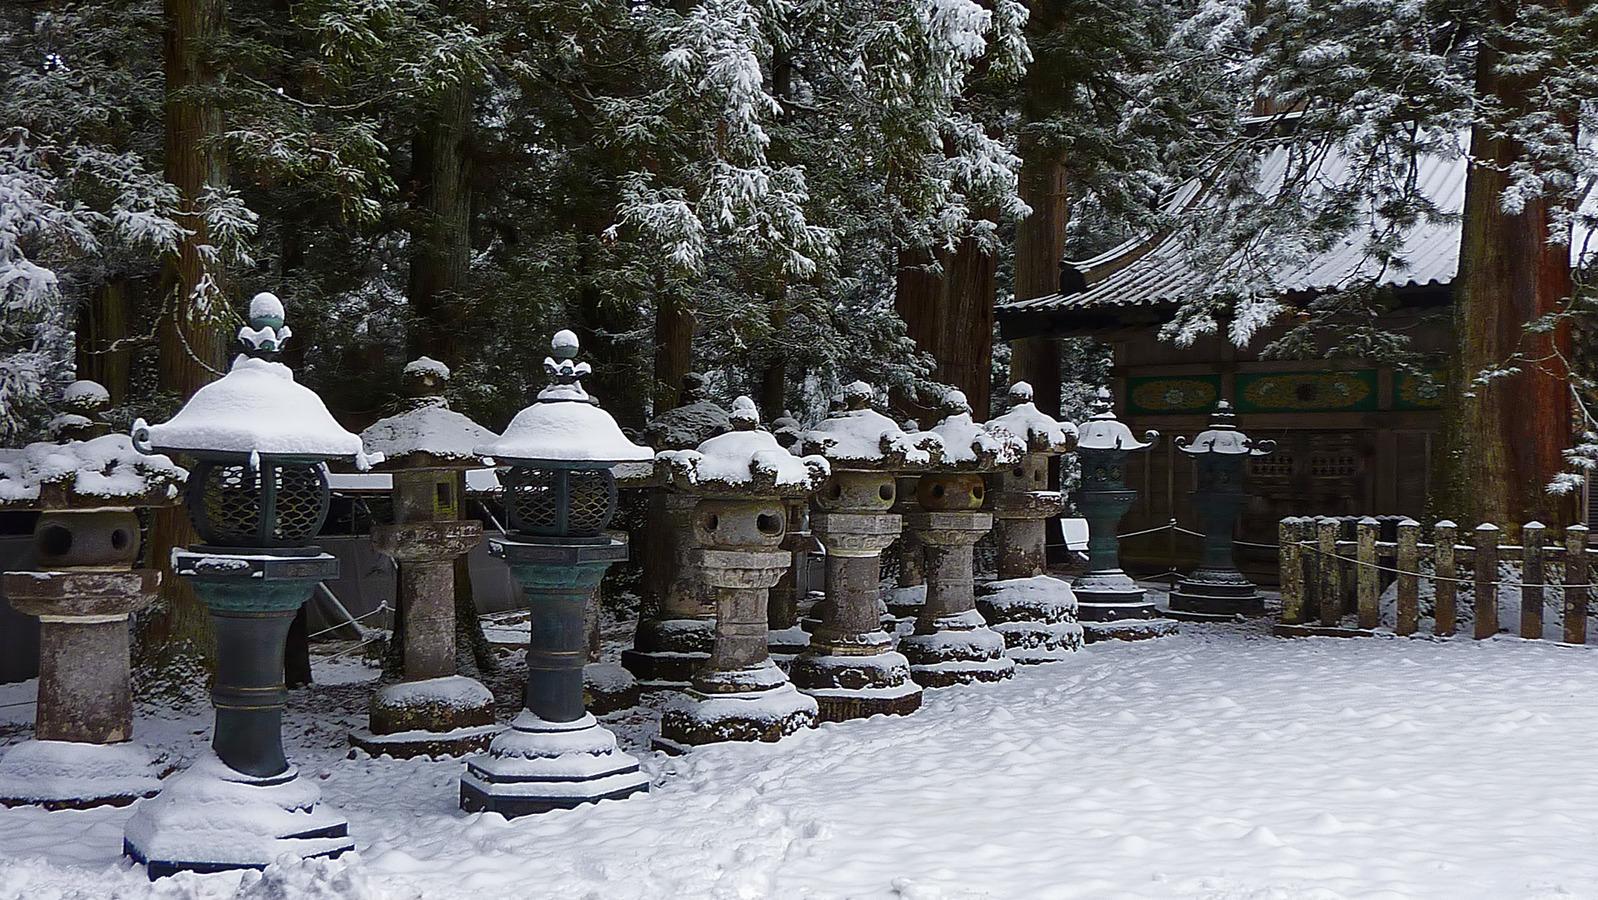 02121750-snowy-toshogu-nikko-japan.jpg